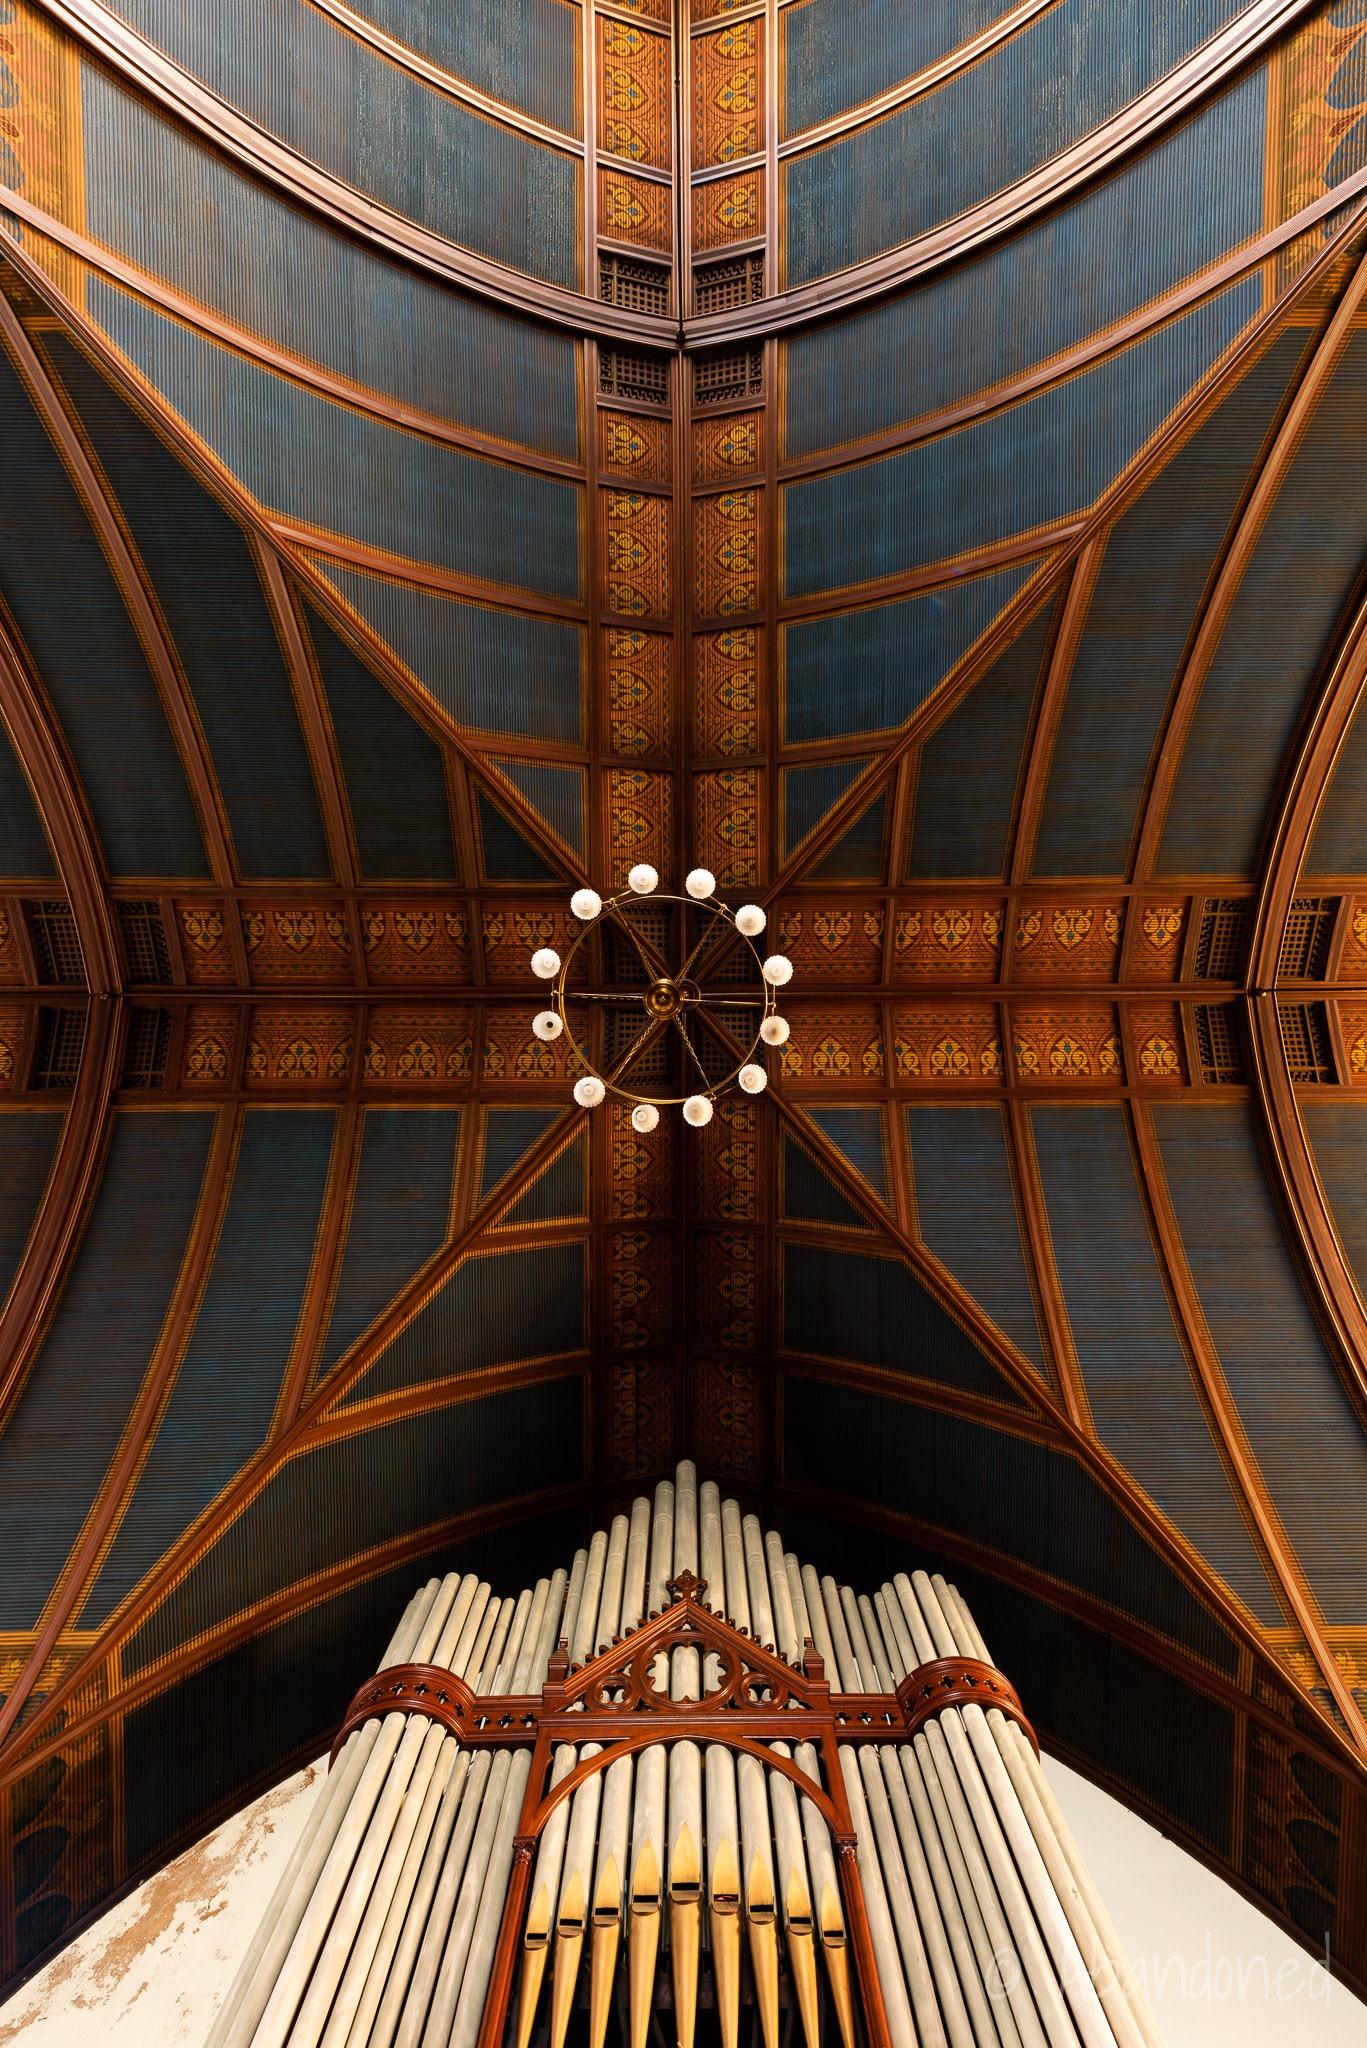 Sanctuary Ceiling